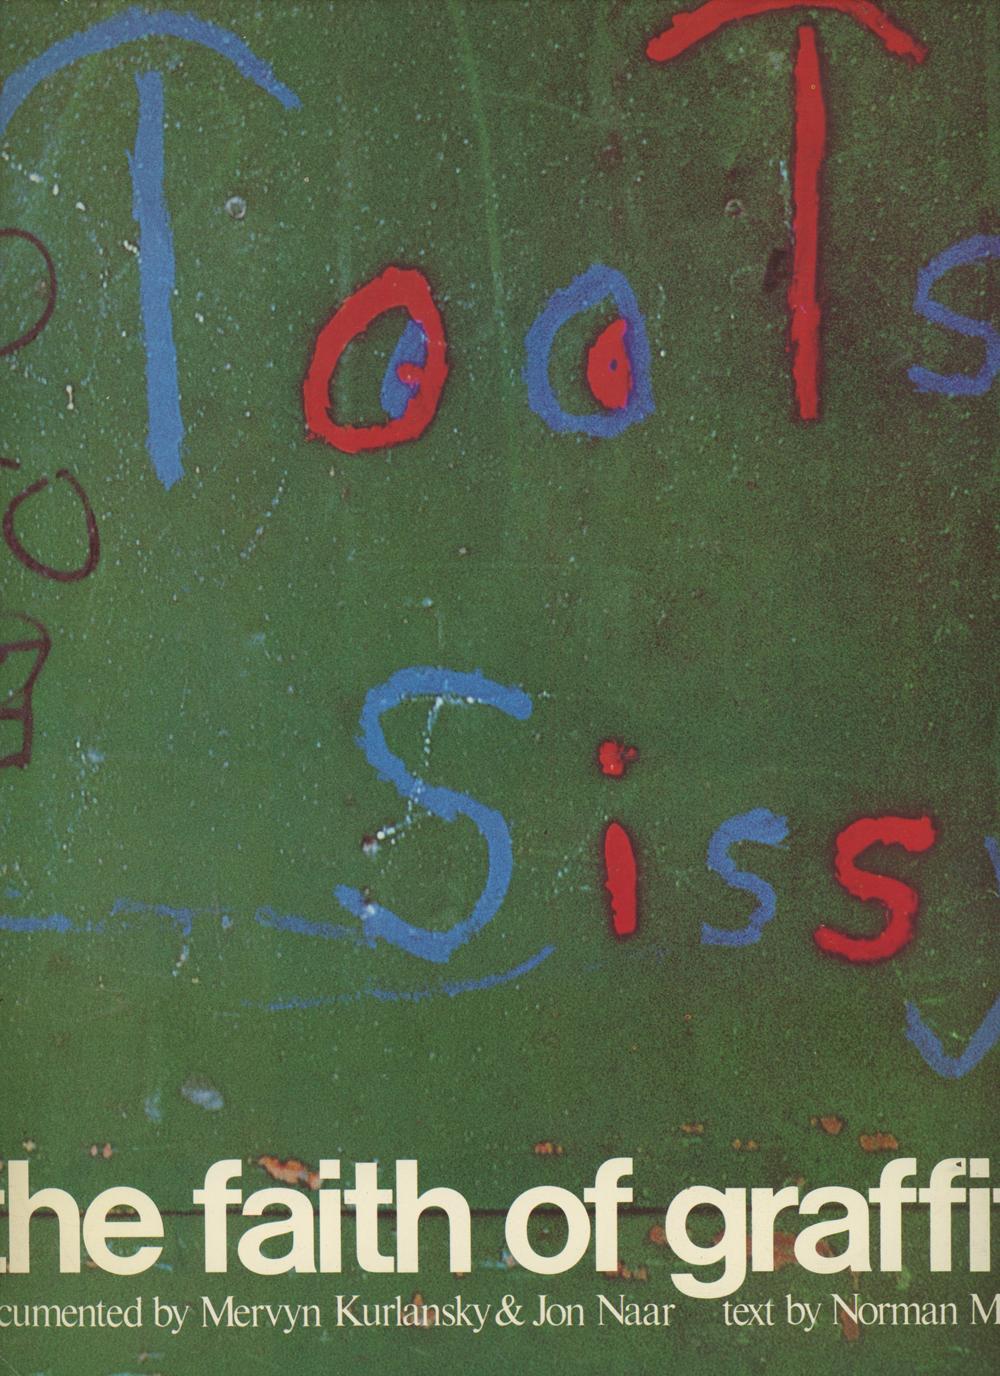 The Faith of Graffiti: Mailer, Norman; Kurlansky, Mervyn and Jon Naar (photog.)